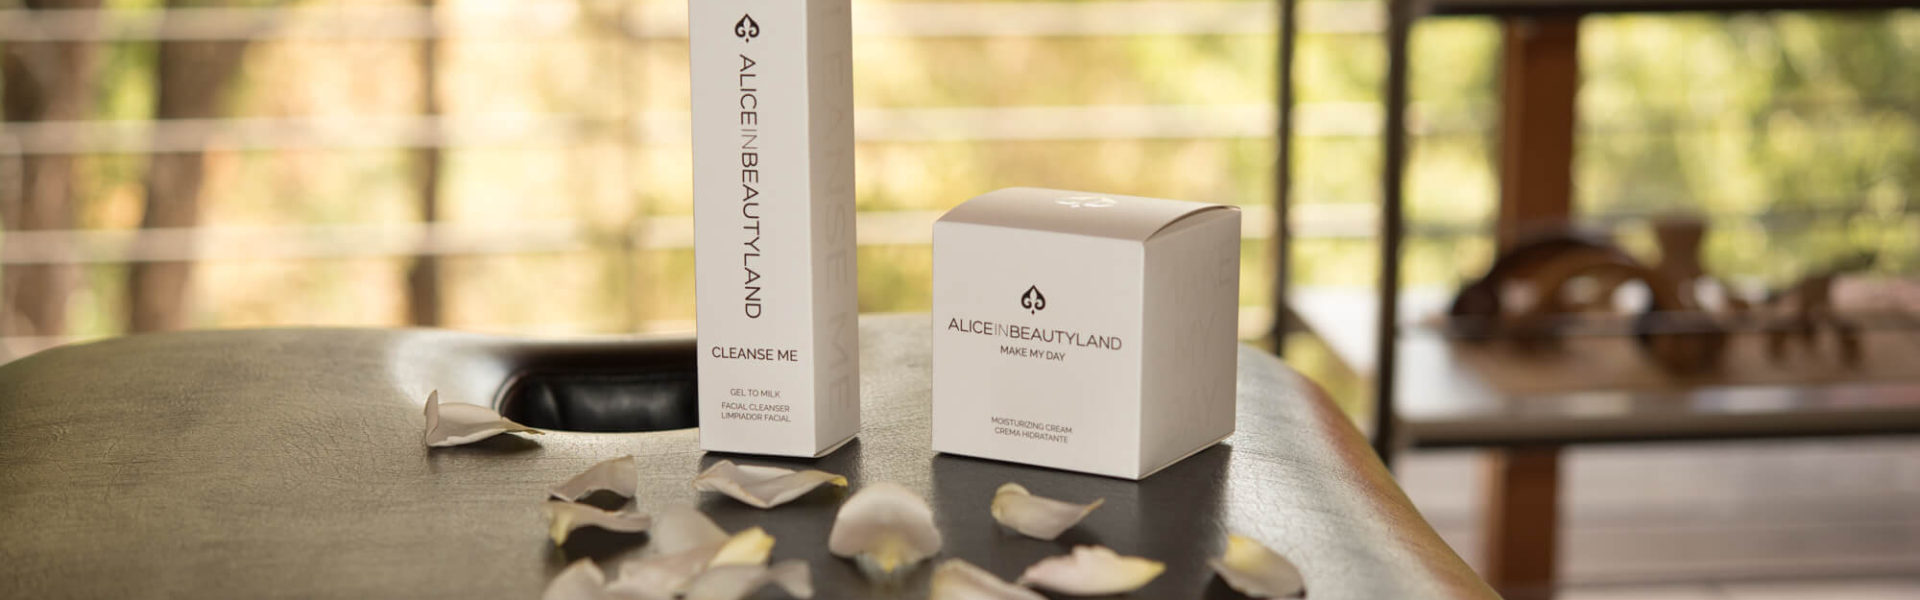 Balnearios y Spas-Alice in Beautyland-Skincare